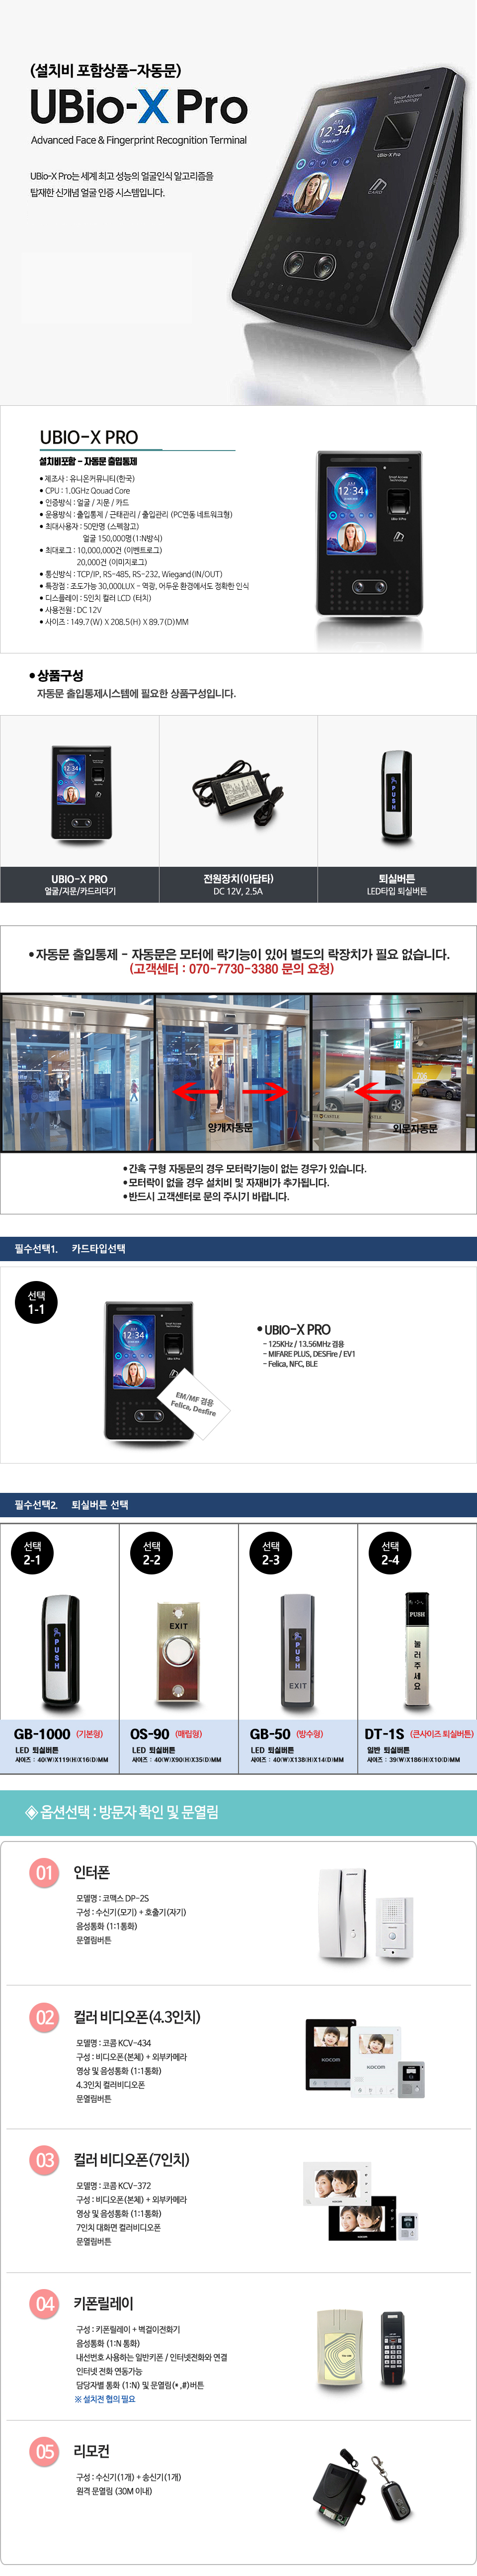 UBIO-XPRO설치비포함작업-자동문.jpg